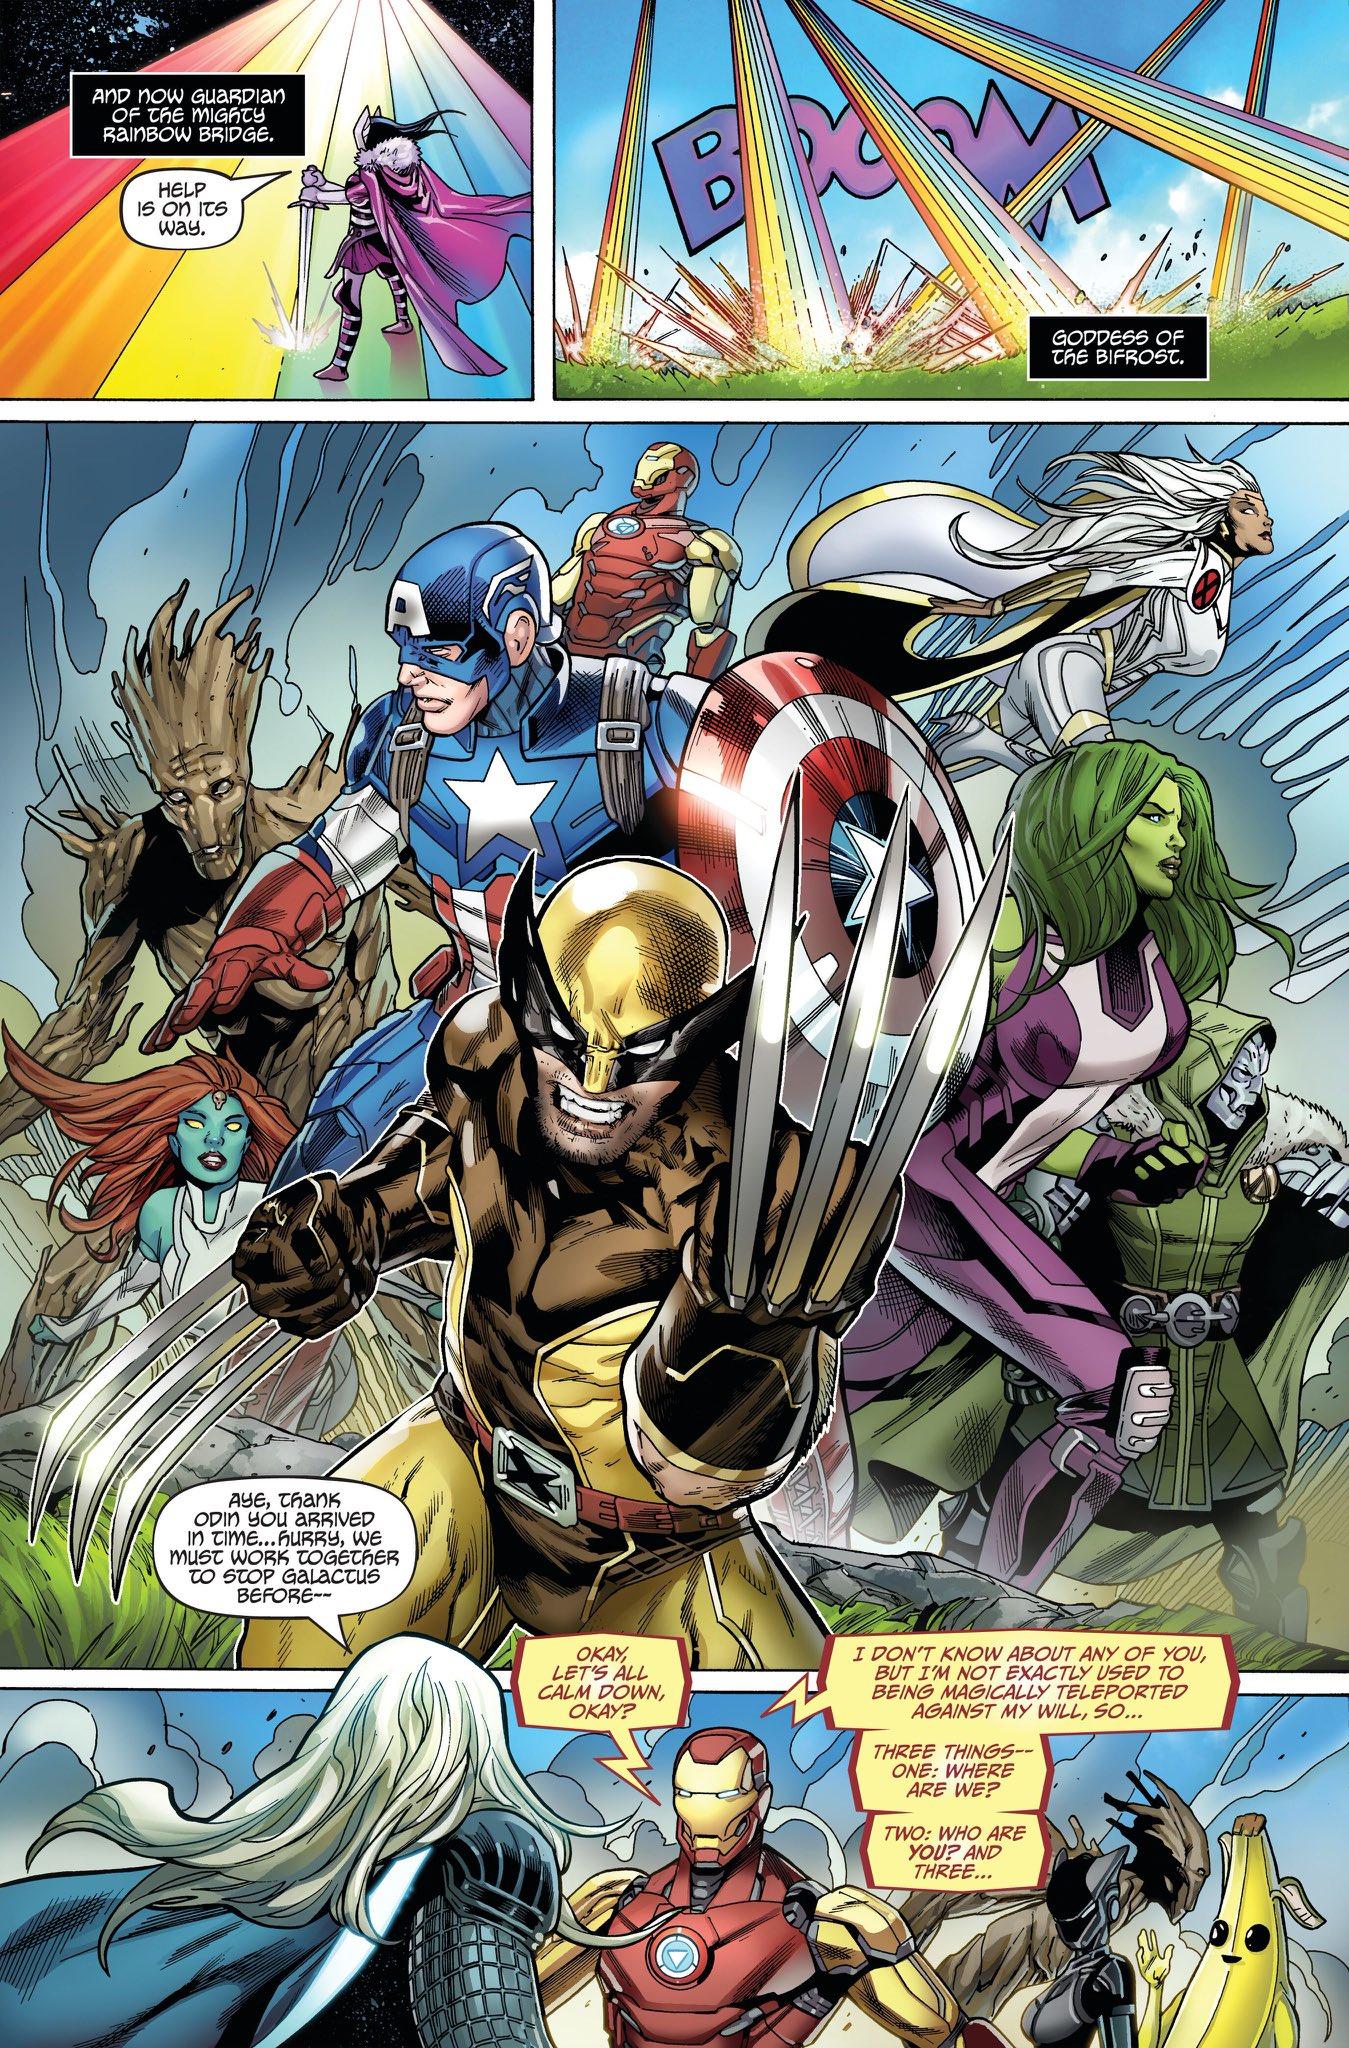 Fortnite Comic book part 5